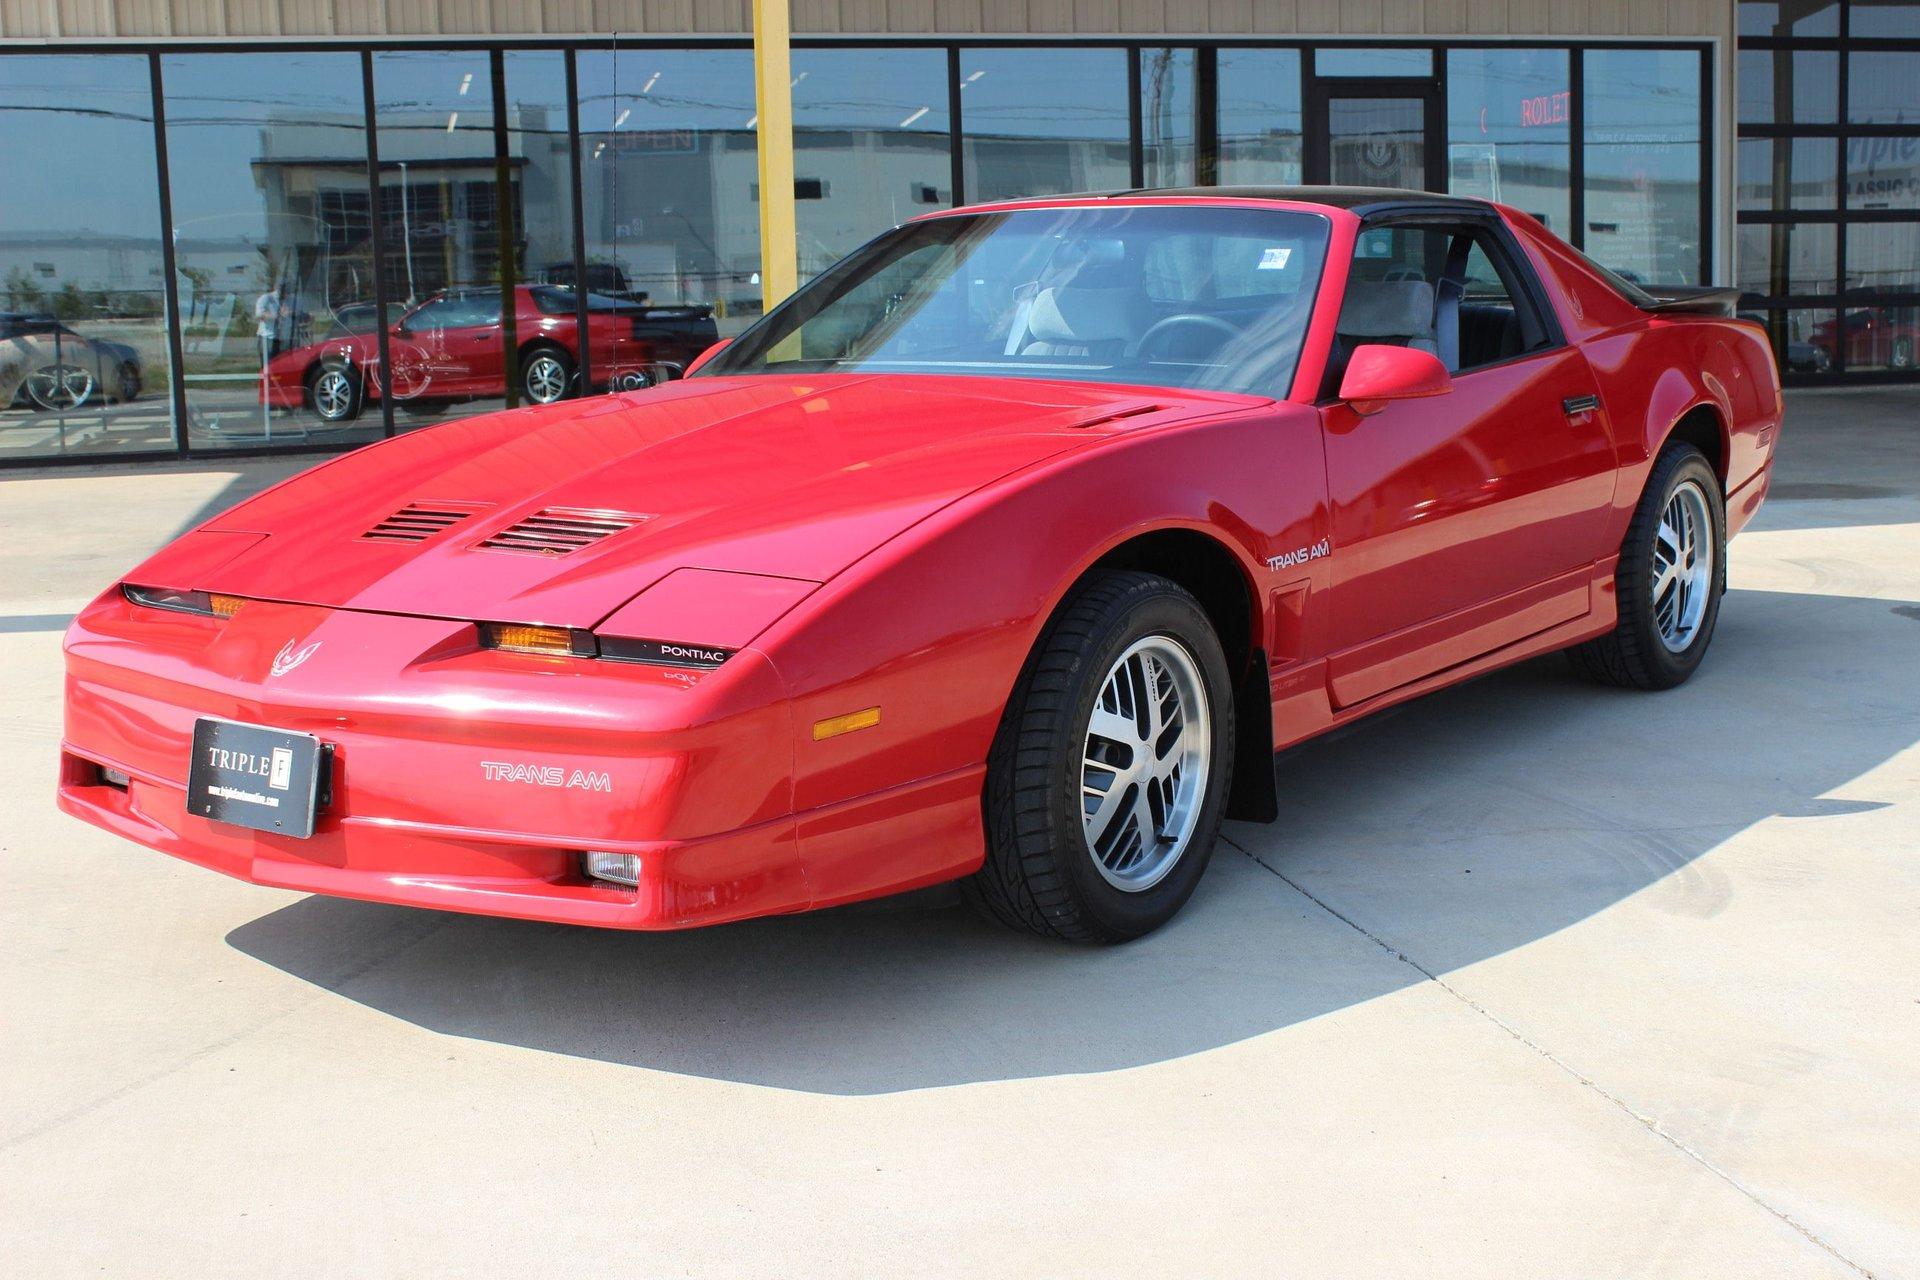 1986 pontiac trans am for sale 205352 motorious 1986 pontiac trans am for sale 205352